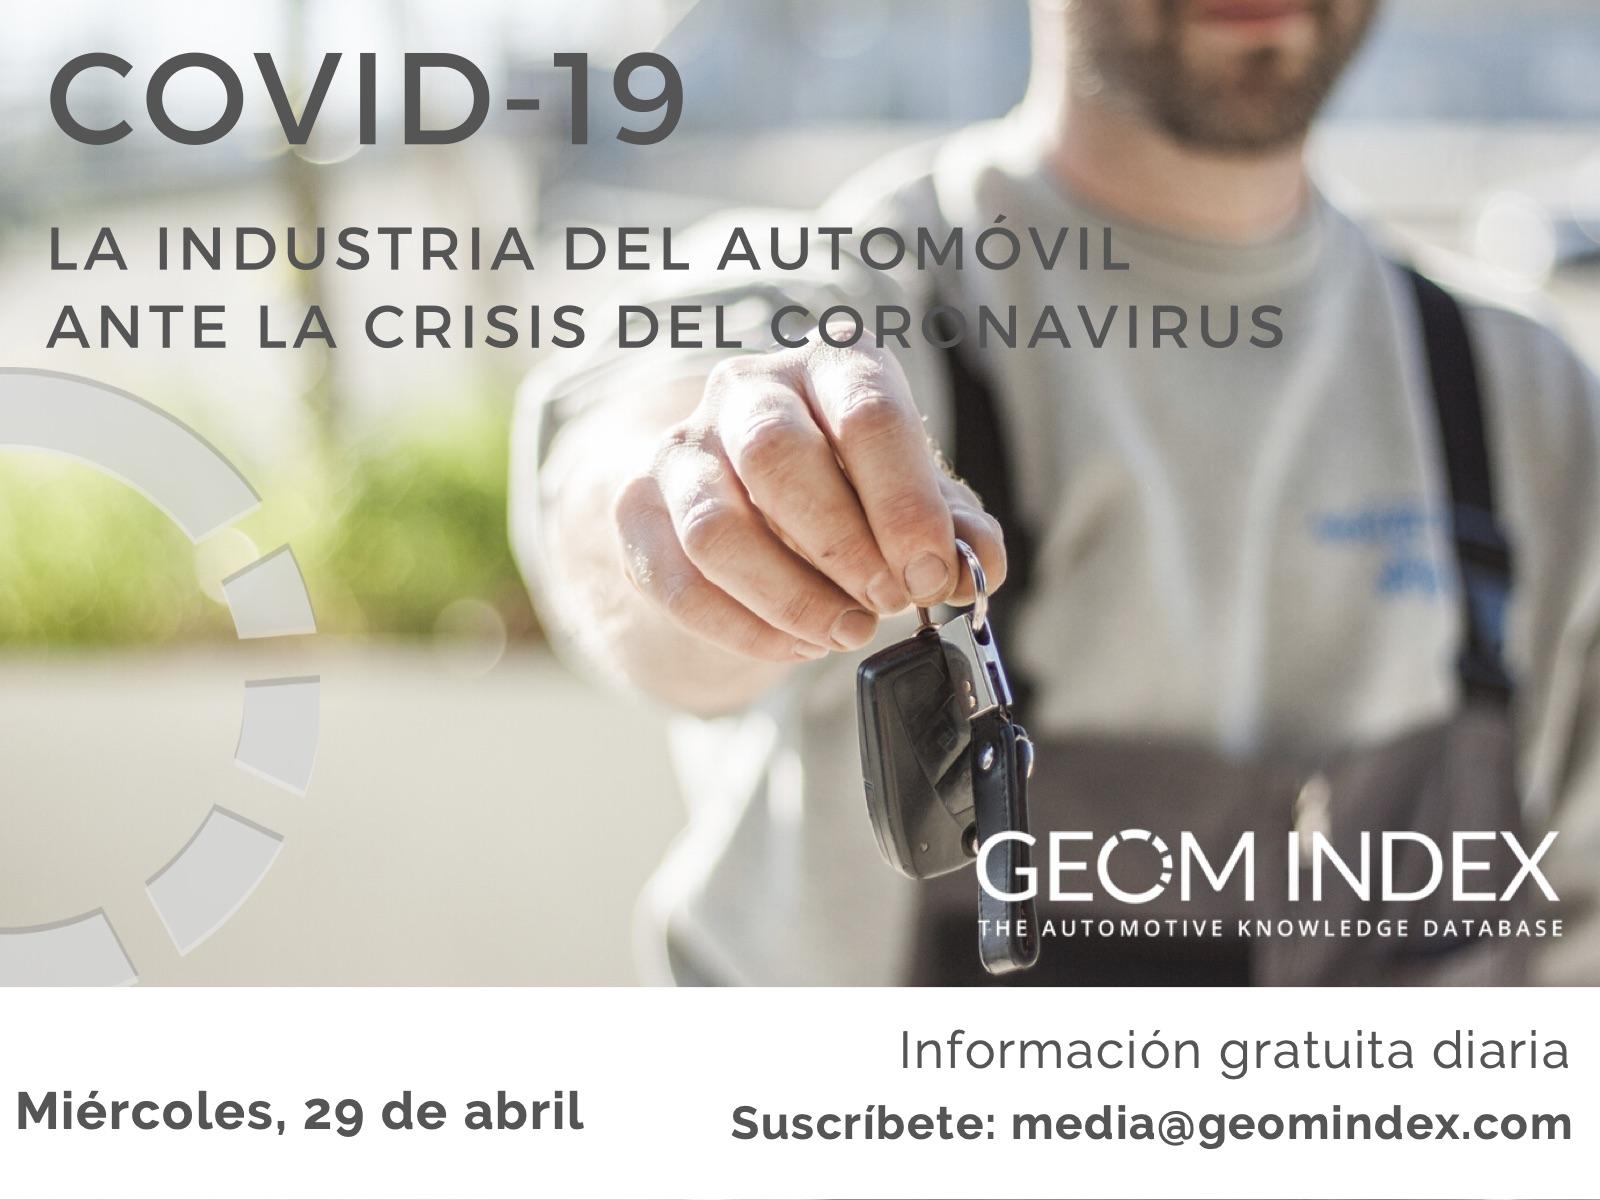 Informe 29 de abril – La industria del automóvil ante la crisis del Covid-19